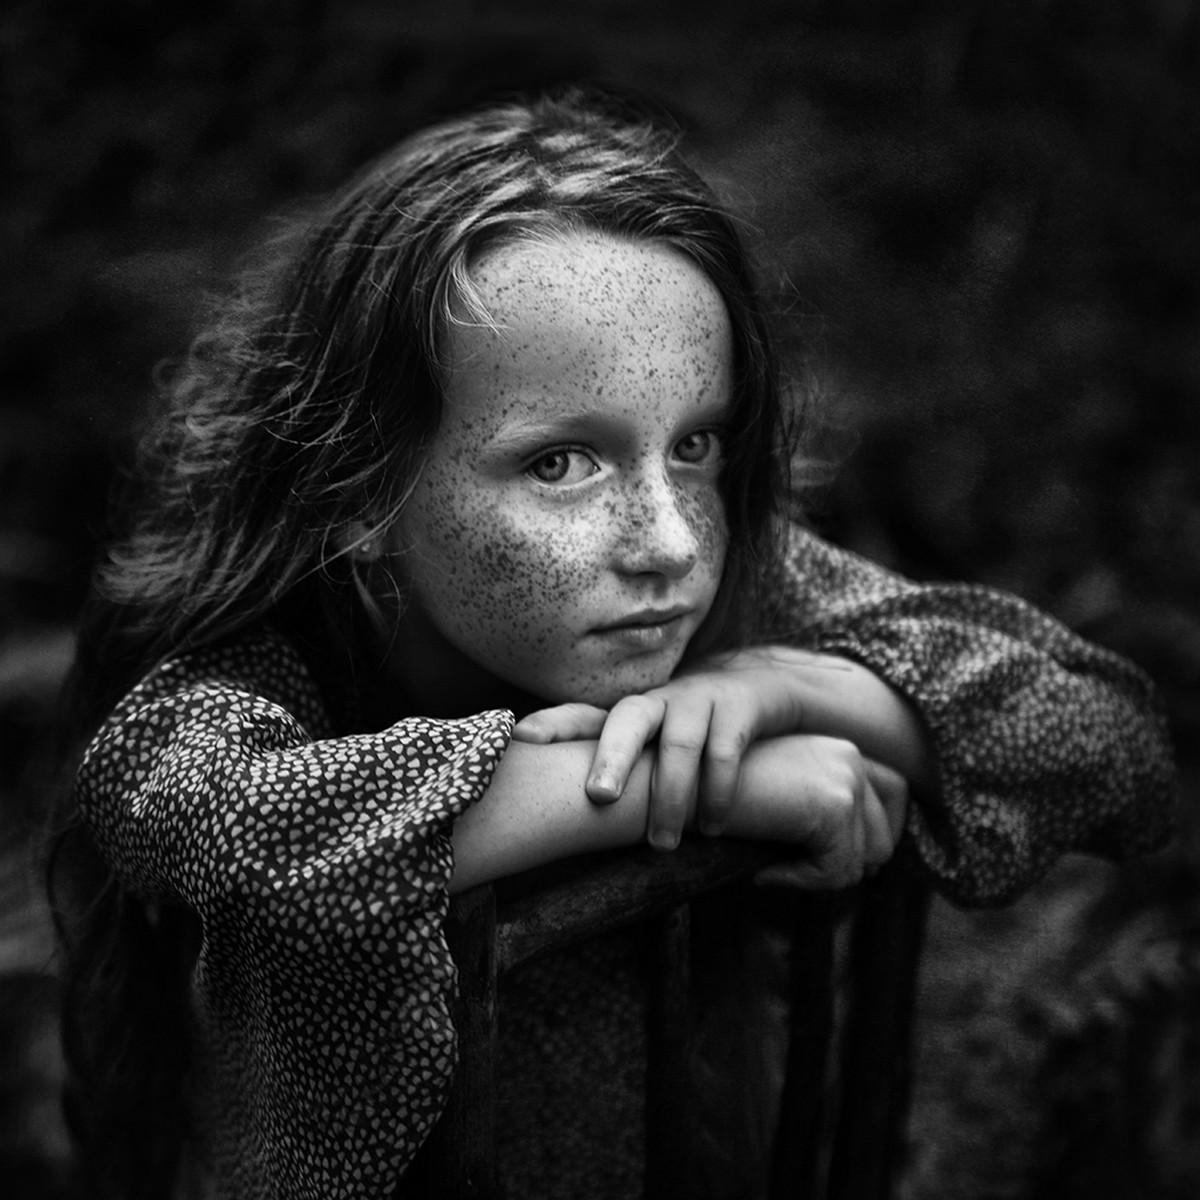 pobediteli_konkursa_herno_beloj_detskoj_fotografii_2018_5